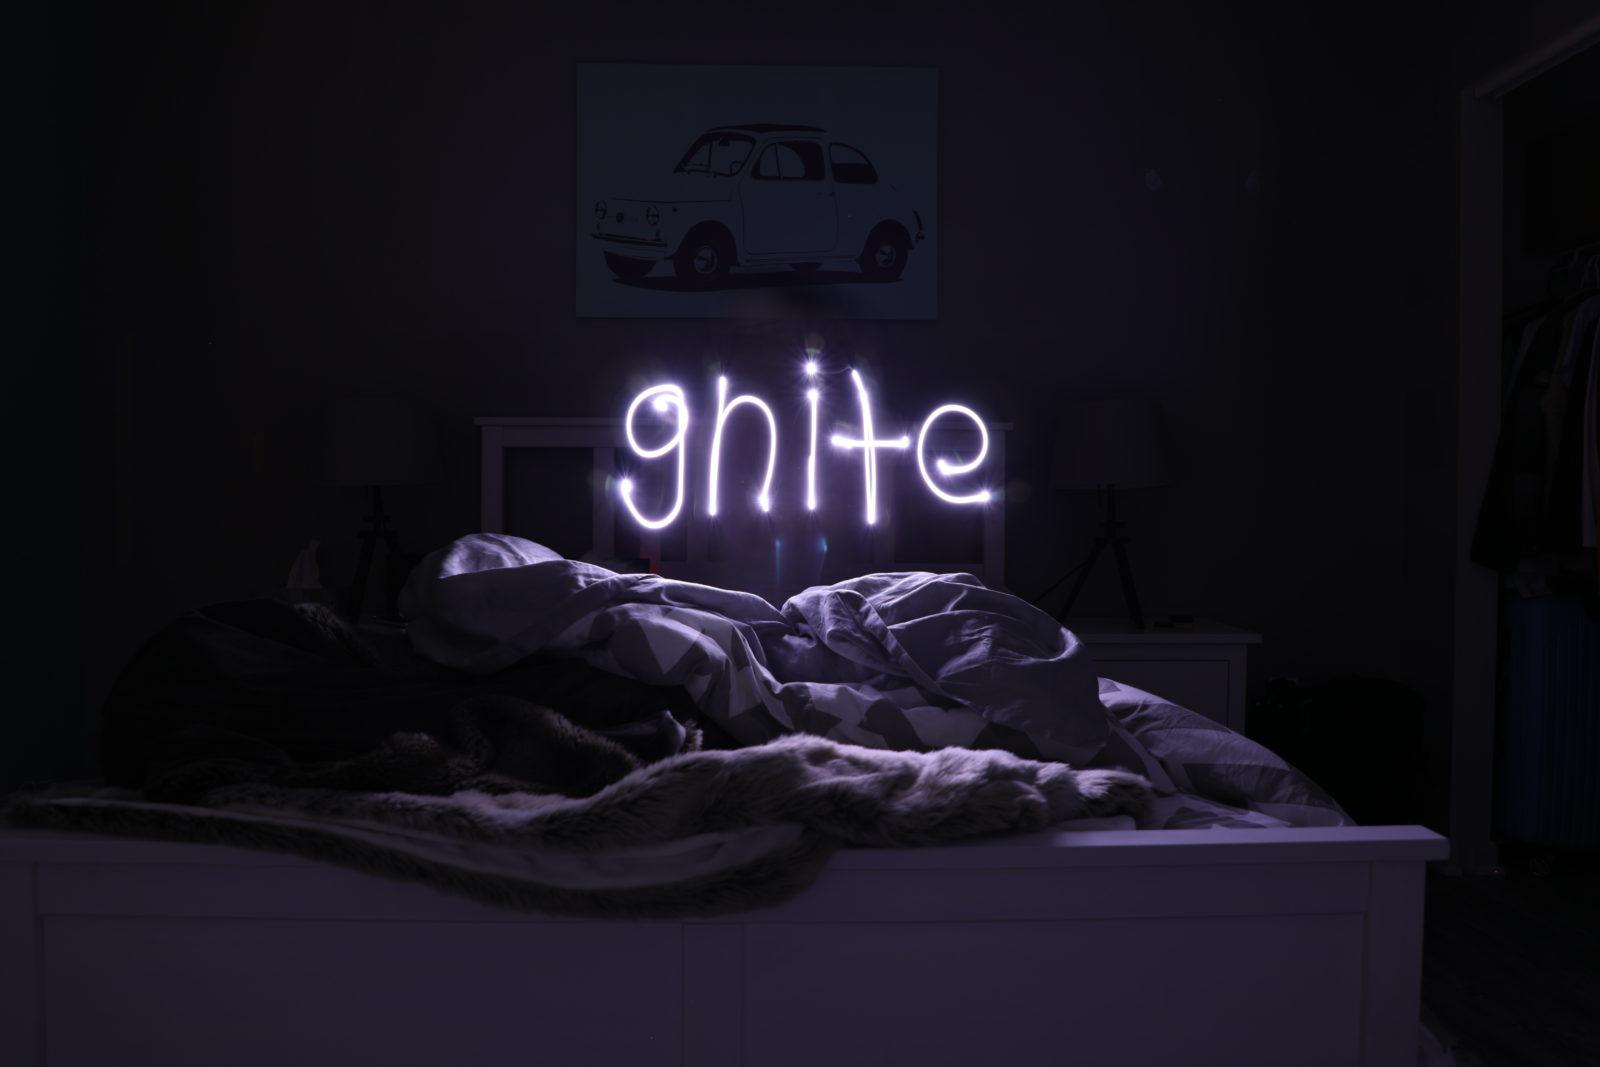 gnite sleepy time with cannabis